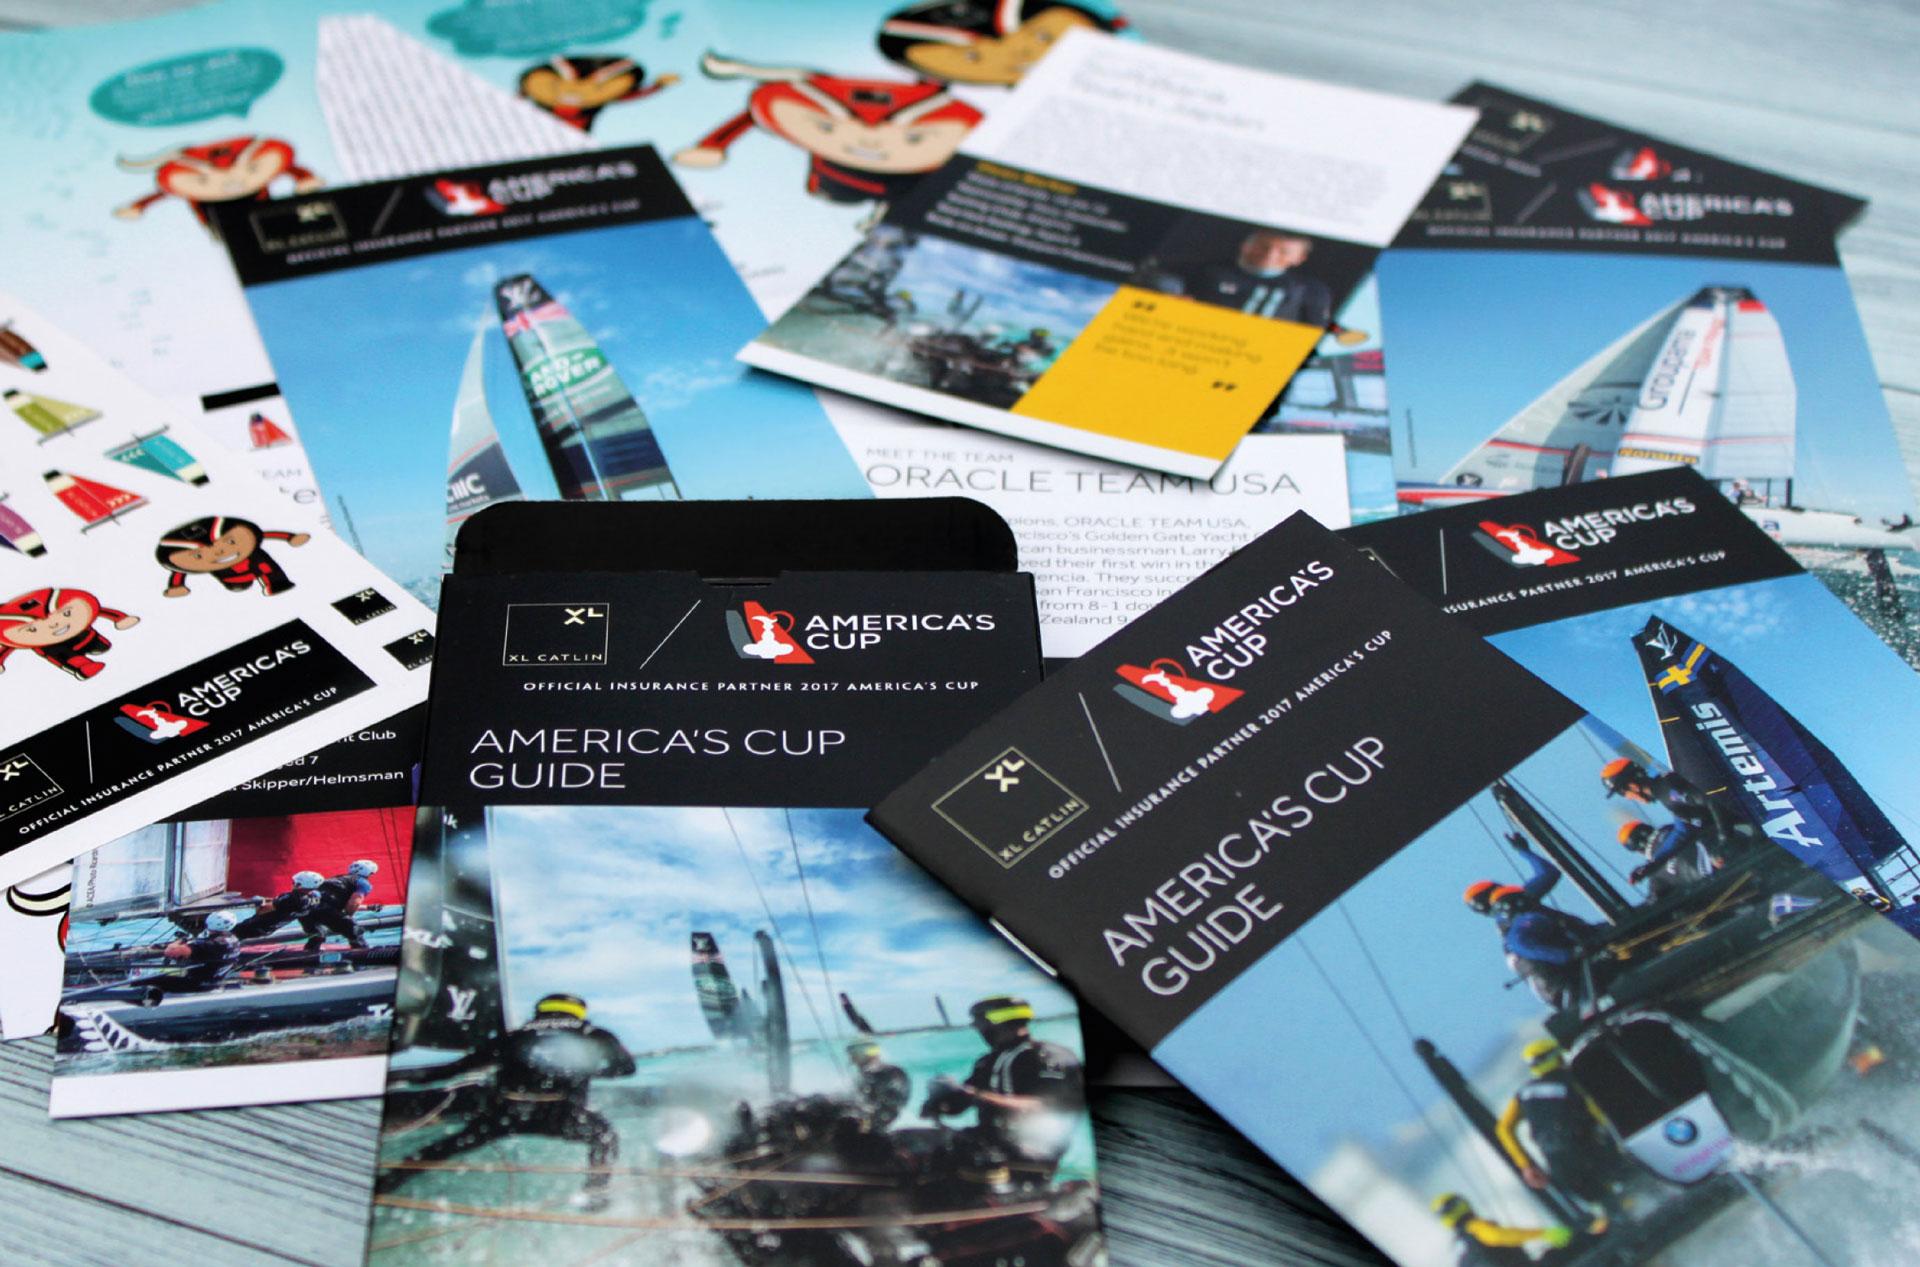 Glendale Creative Americas Cup Pack